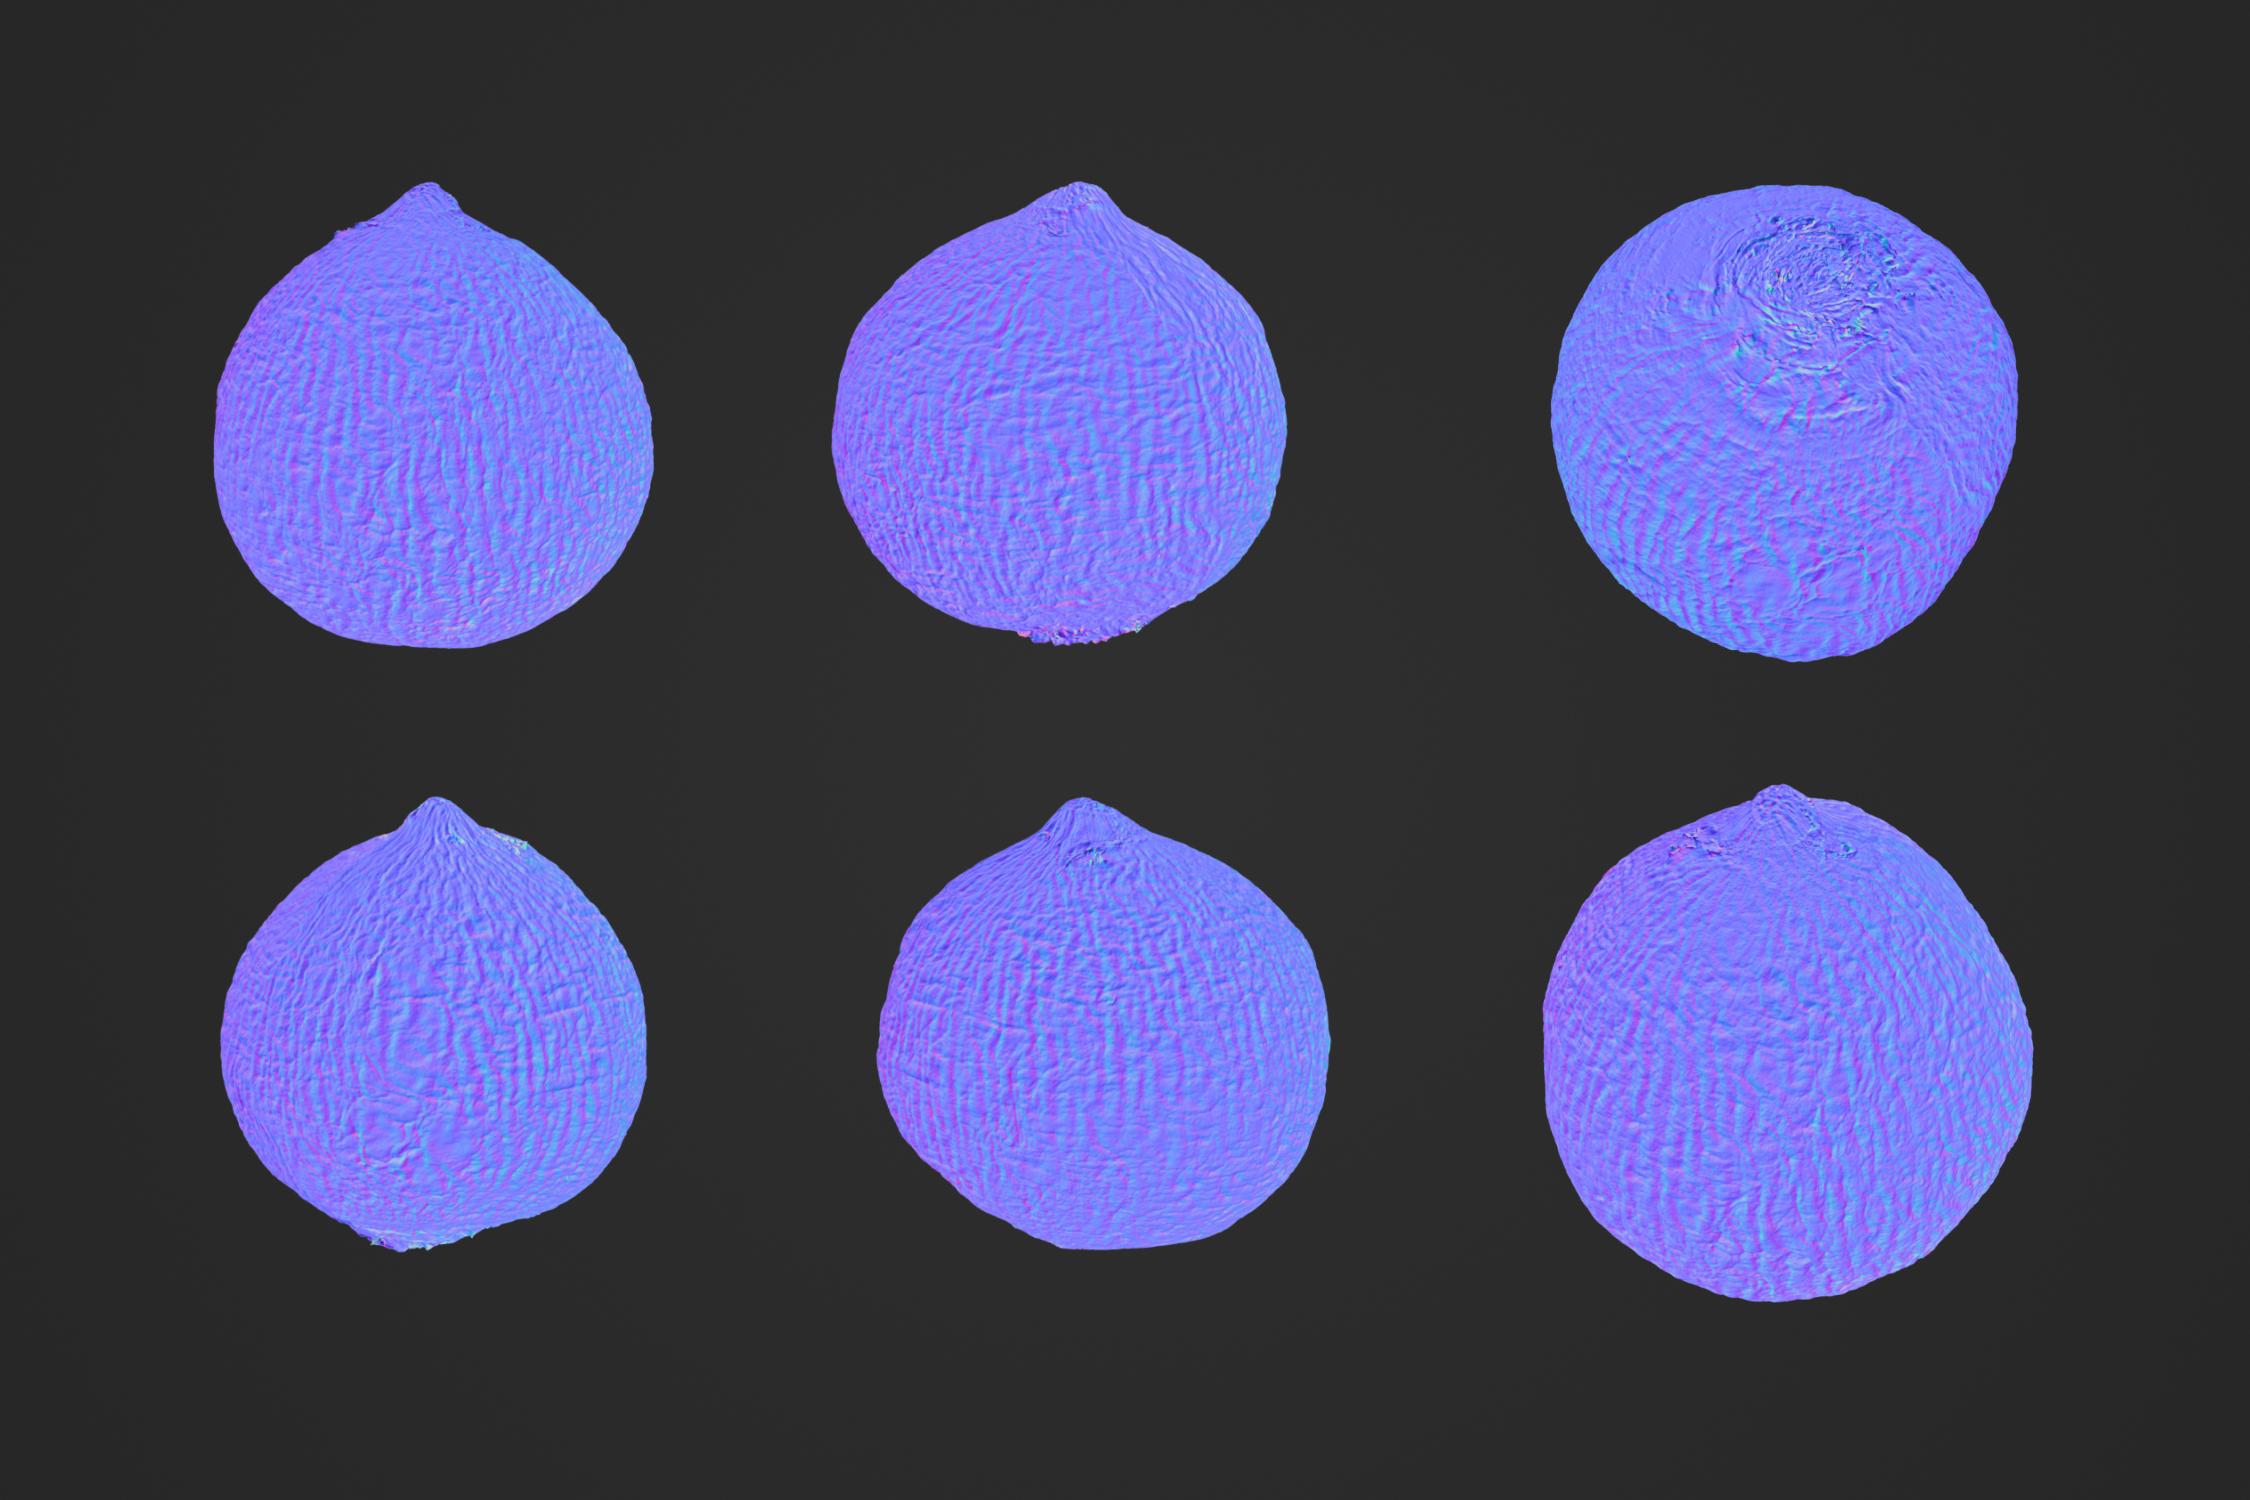 Turnip_1_3.jpg